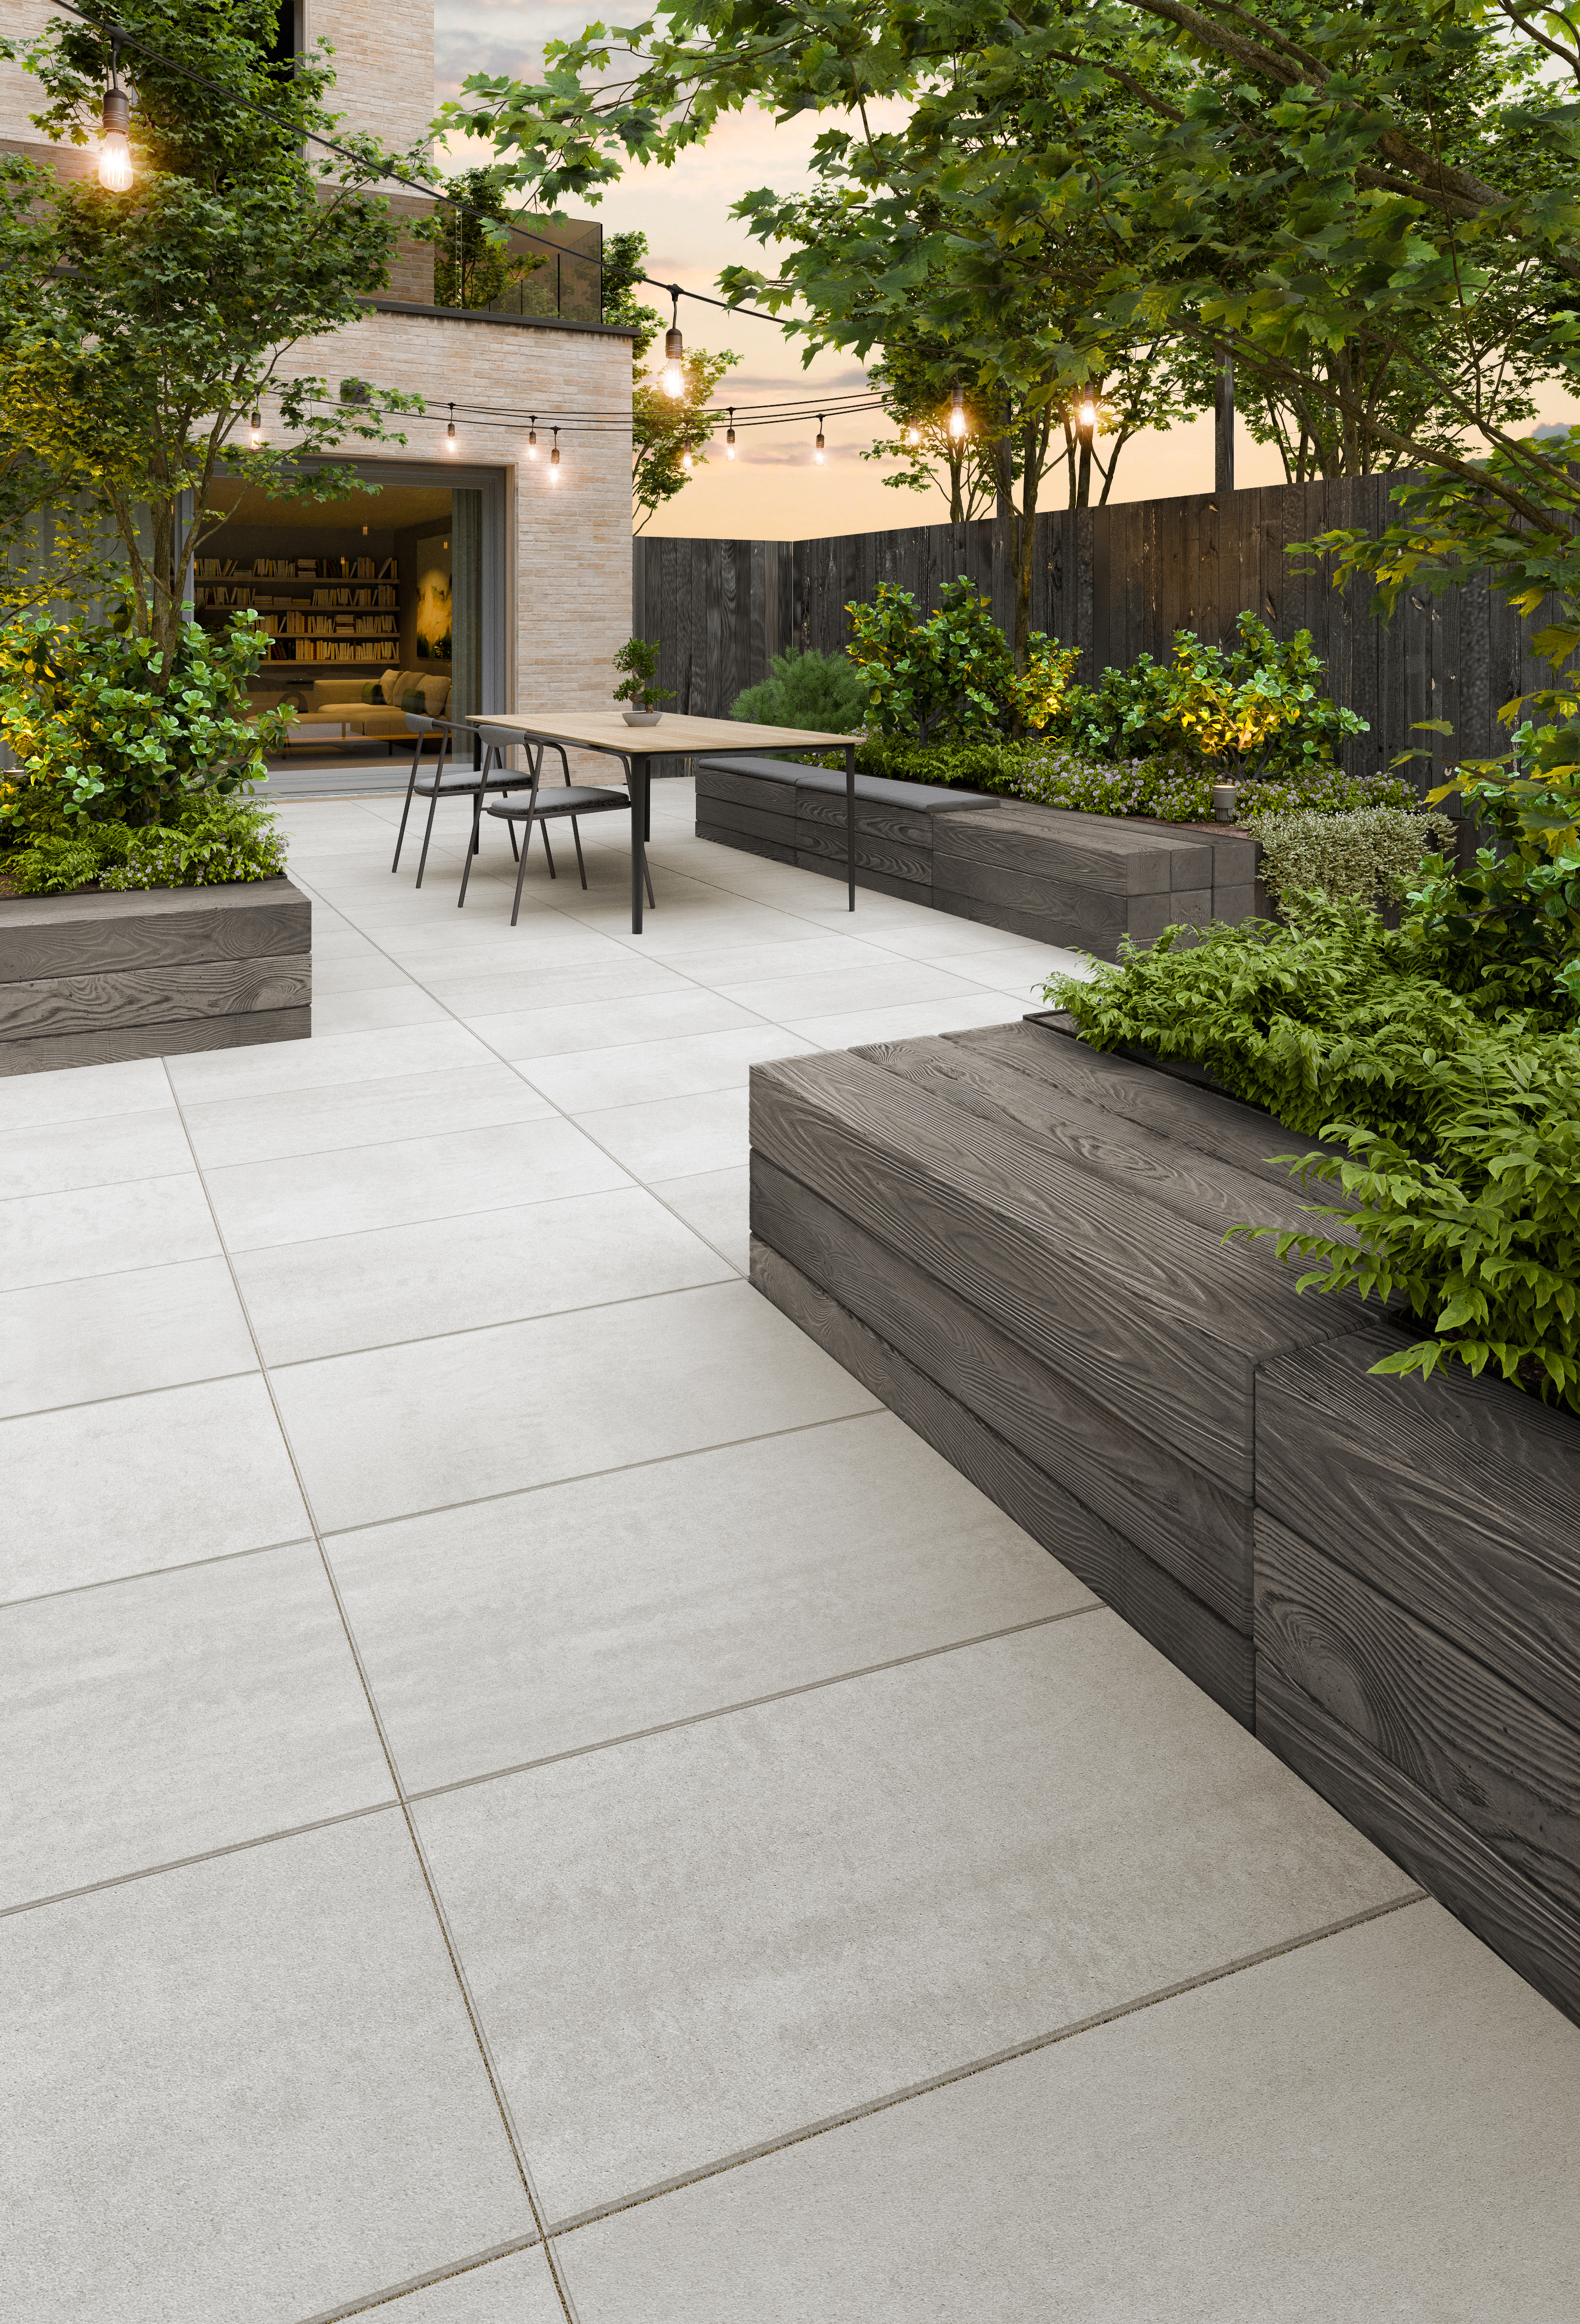 Borealis retaining wall and Blu Grande Smooth patio slab